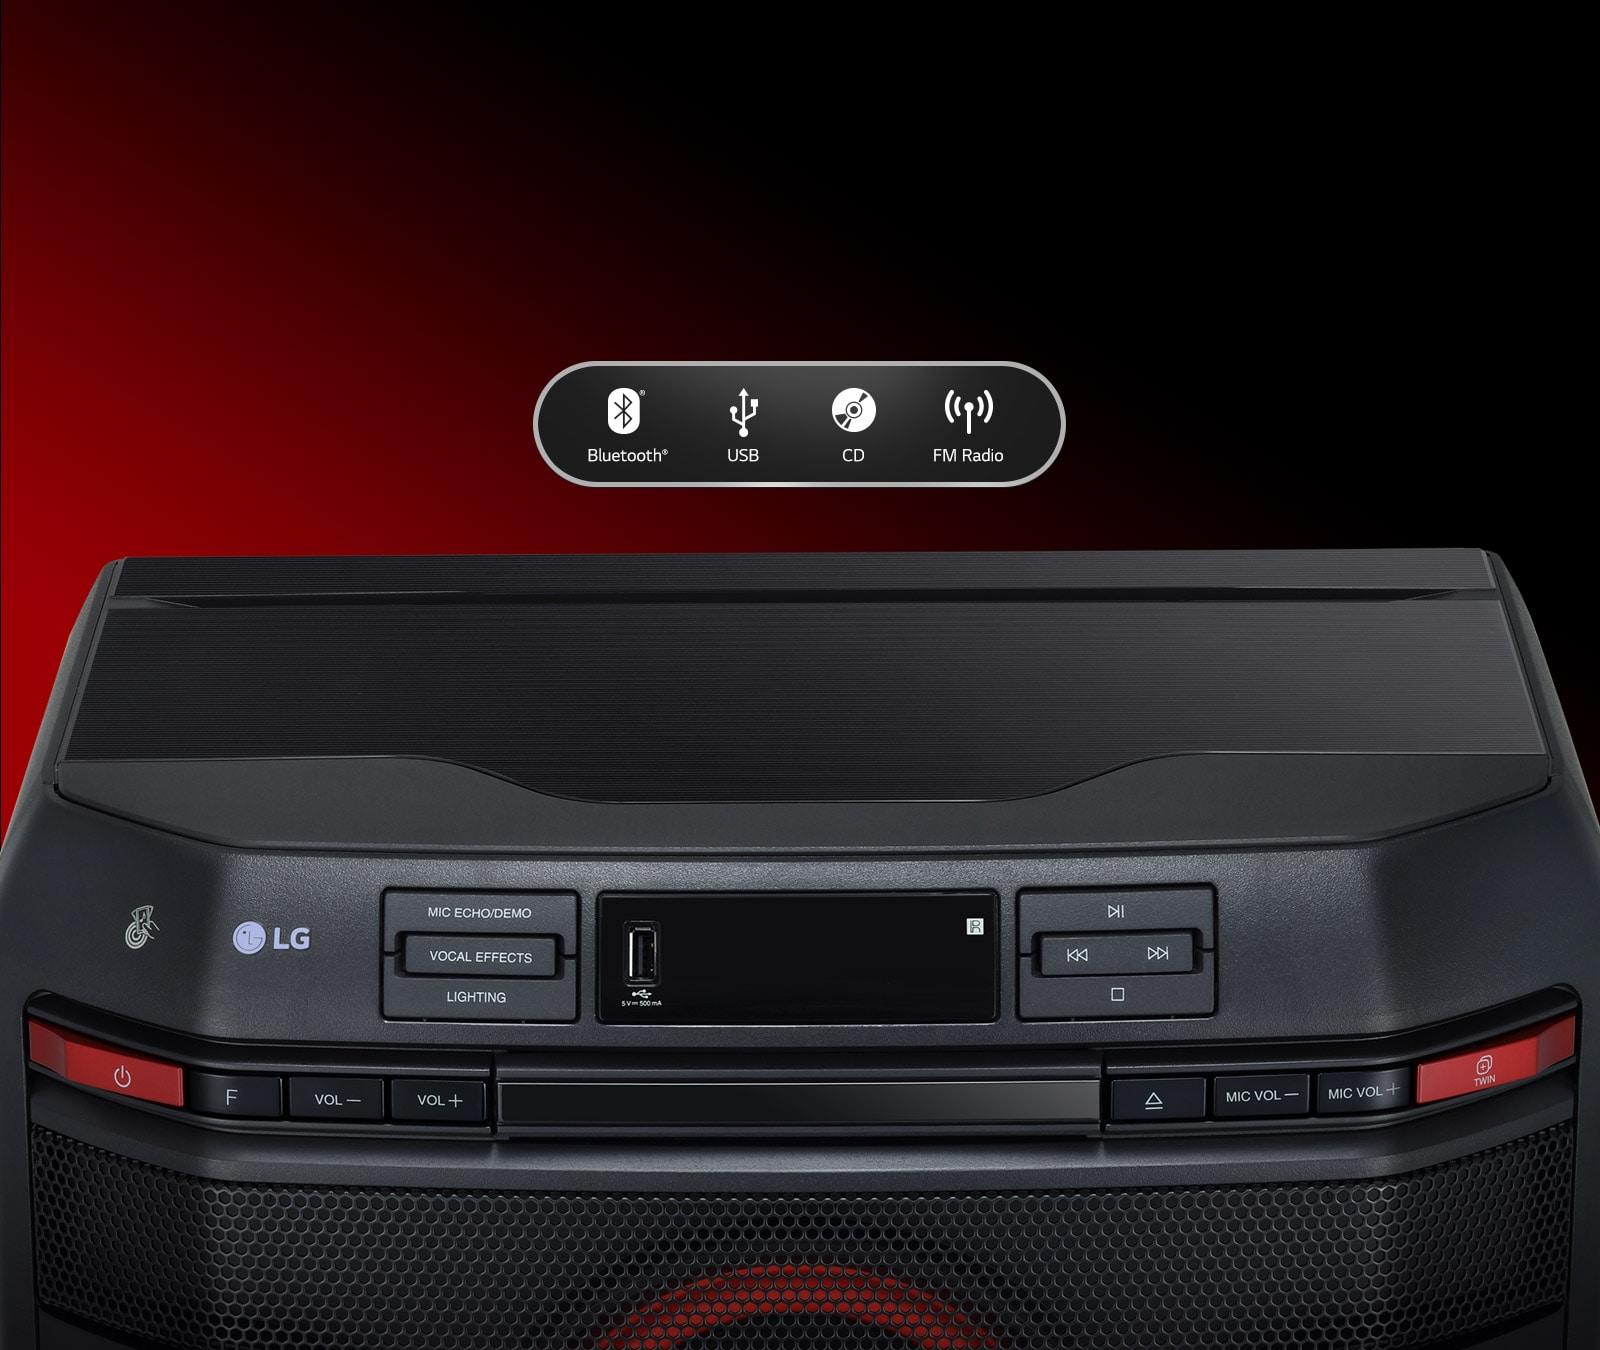 LG XBOOM OL45 Connectivity